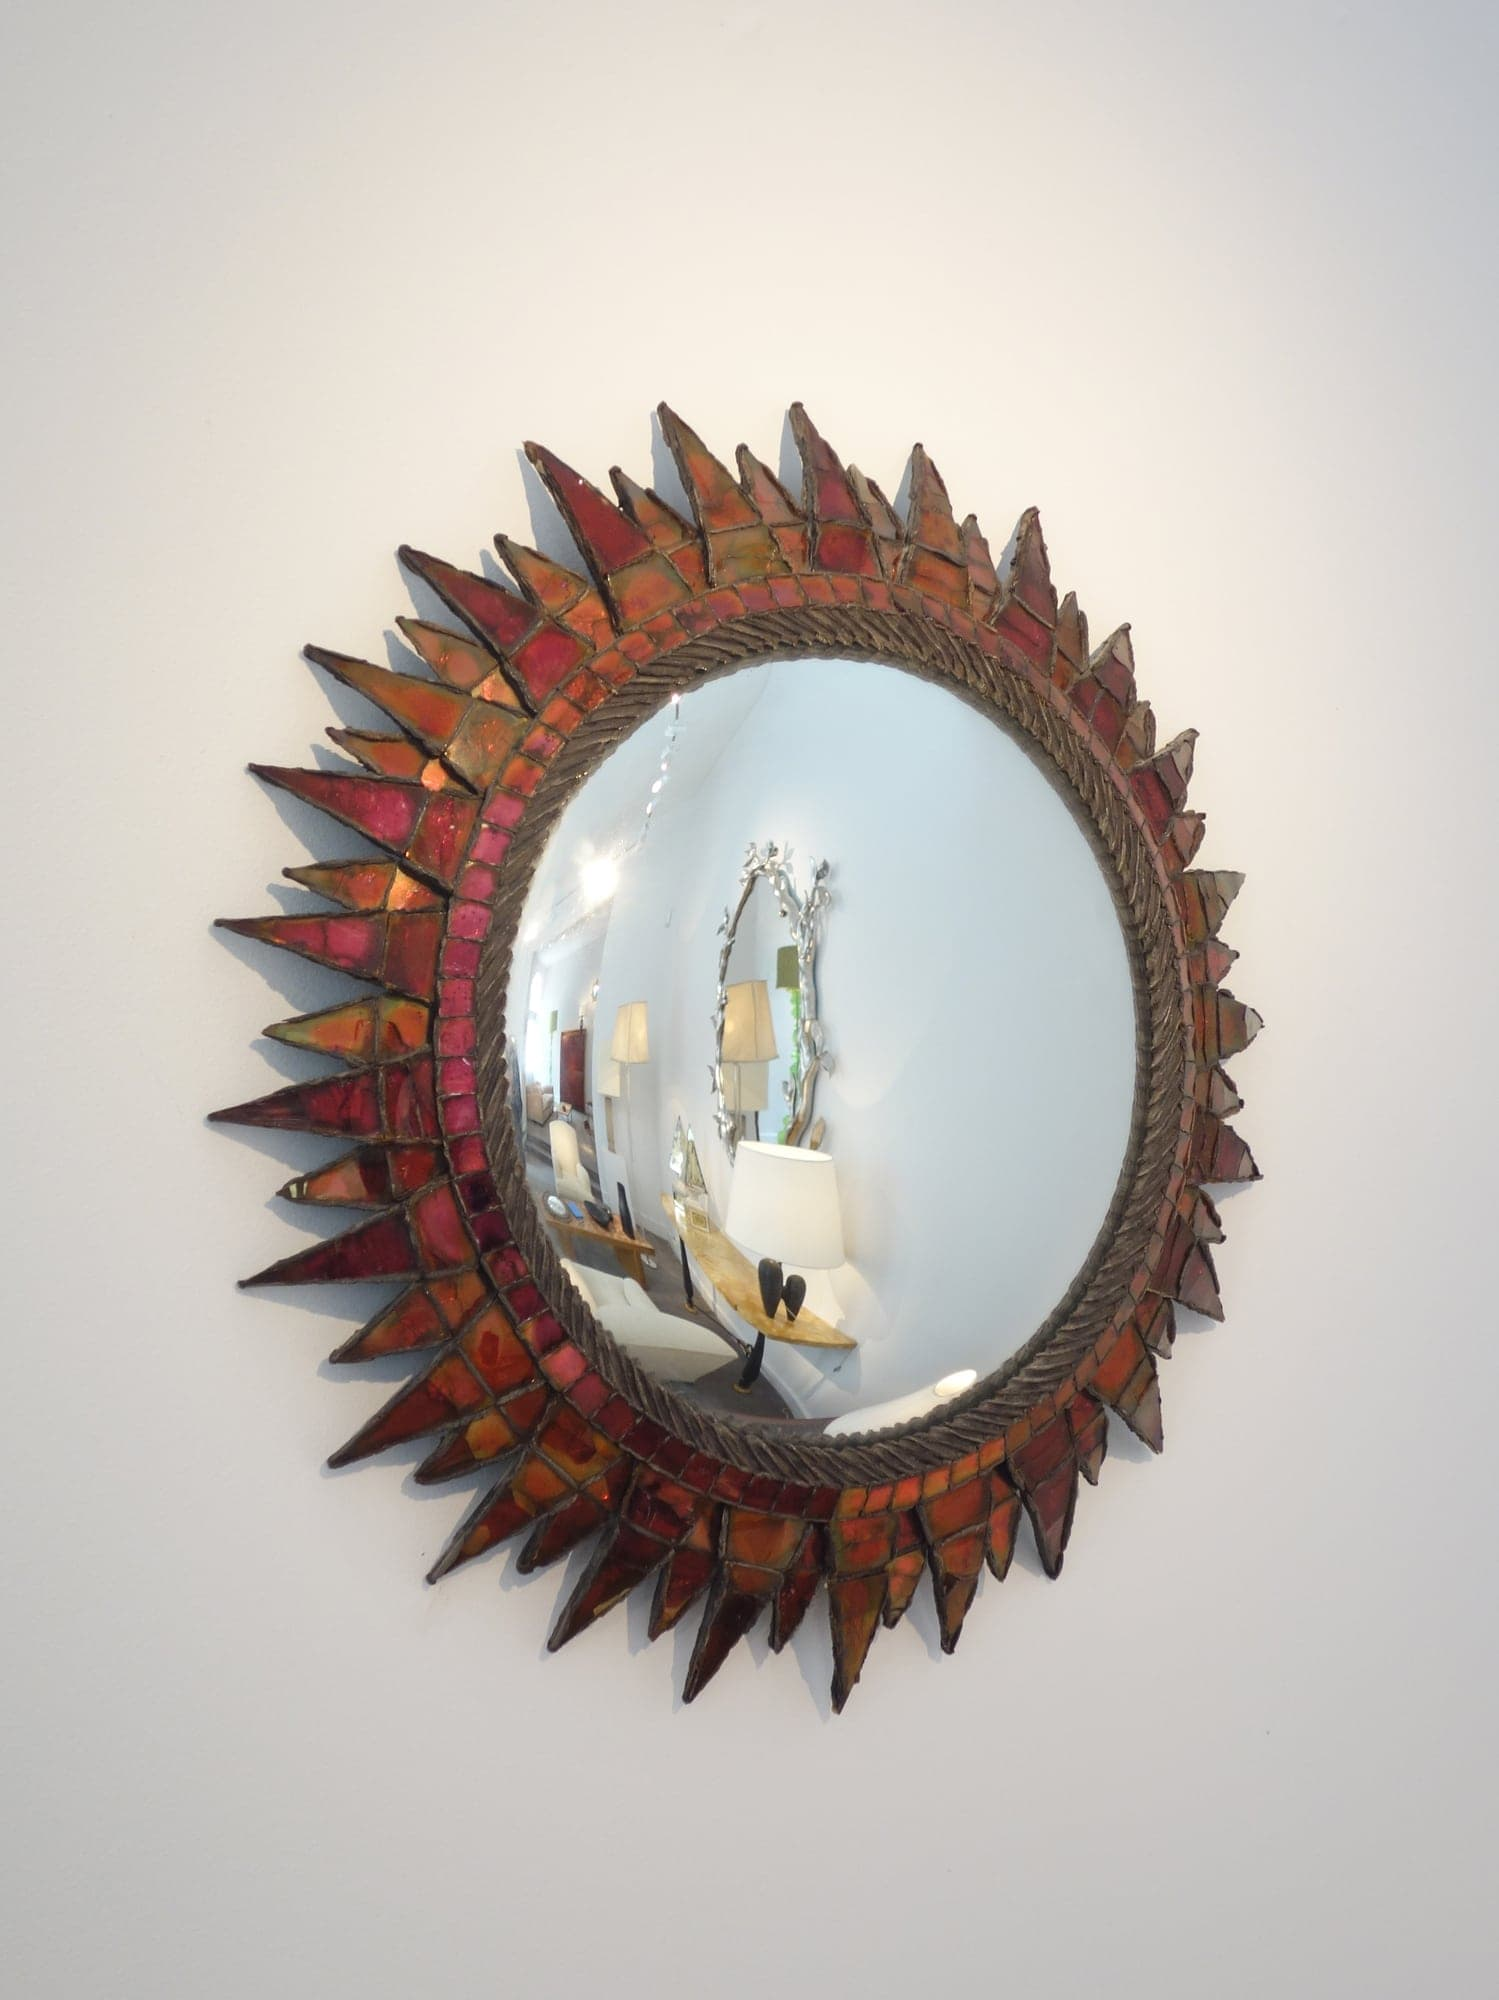 Line Vautrin, Miroir « Soleil à pointes n°3 » (vendu), vue 02